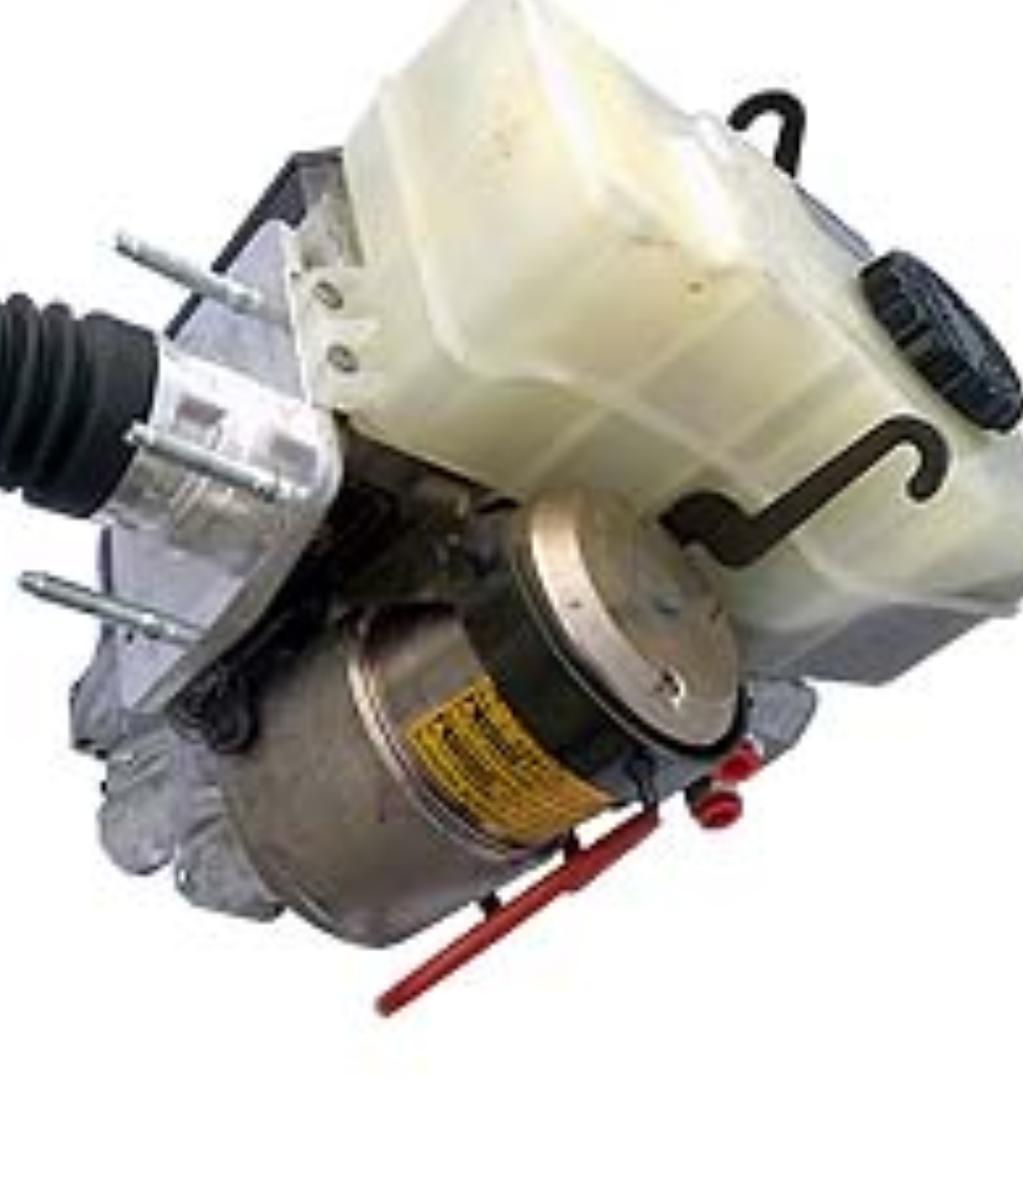 Brake ABS/Master cylinder assembly noise - Toyota 4Runner